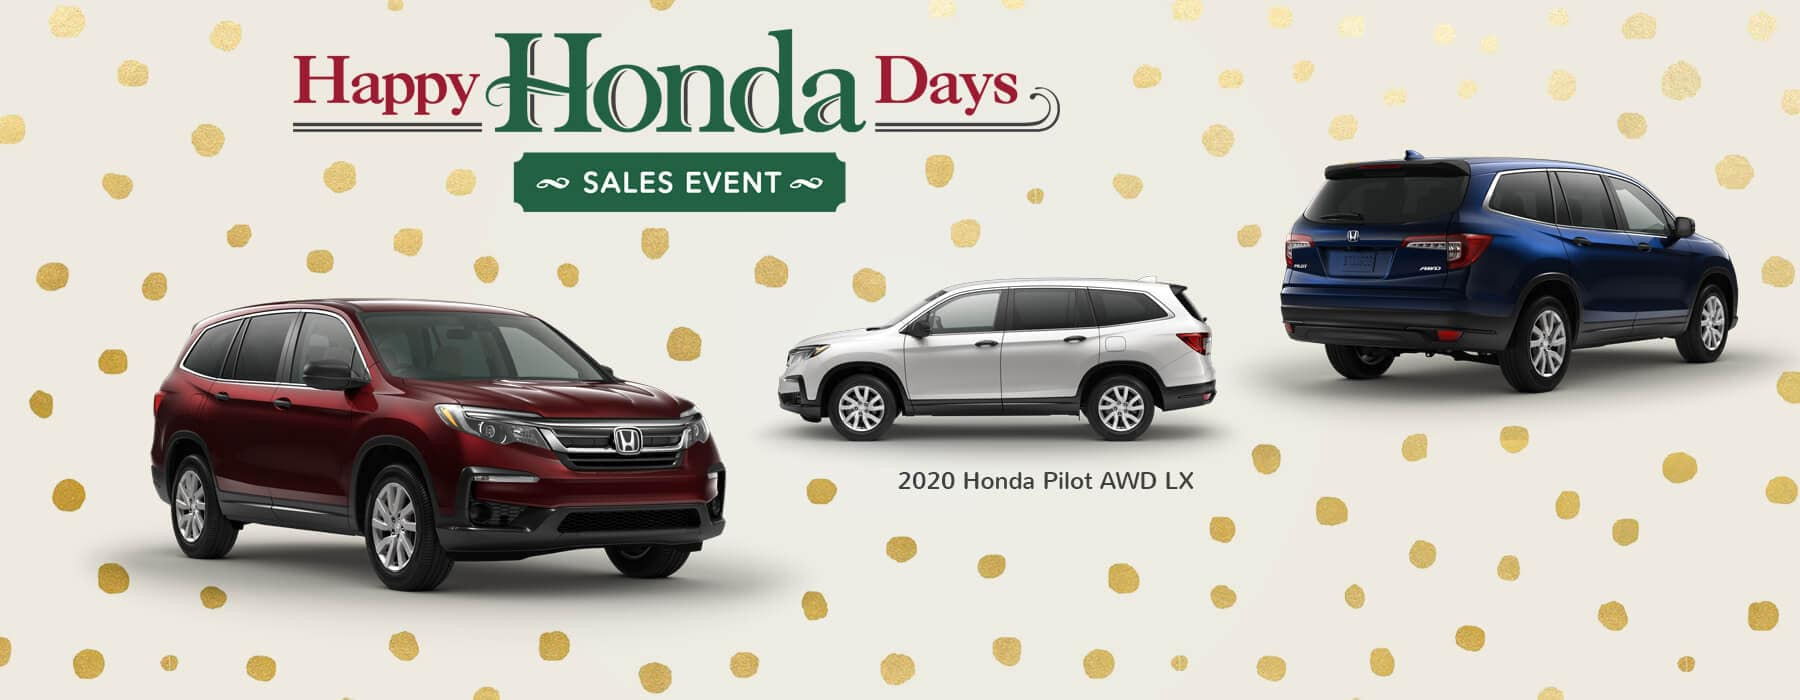 Happy Honda Days Sales Event 2020 Honda Pilot Slider